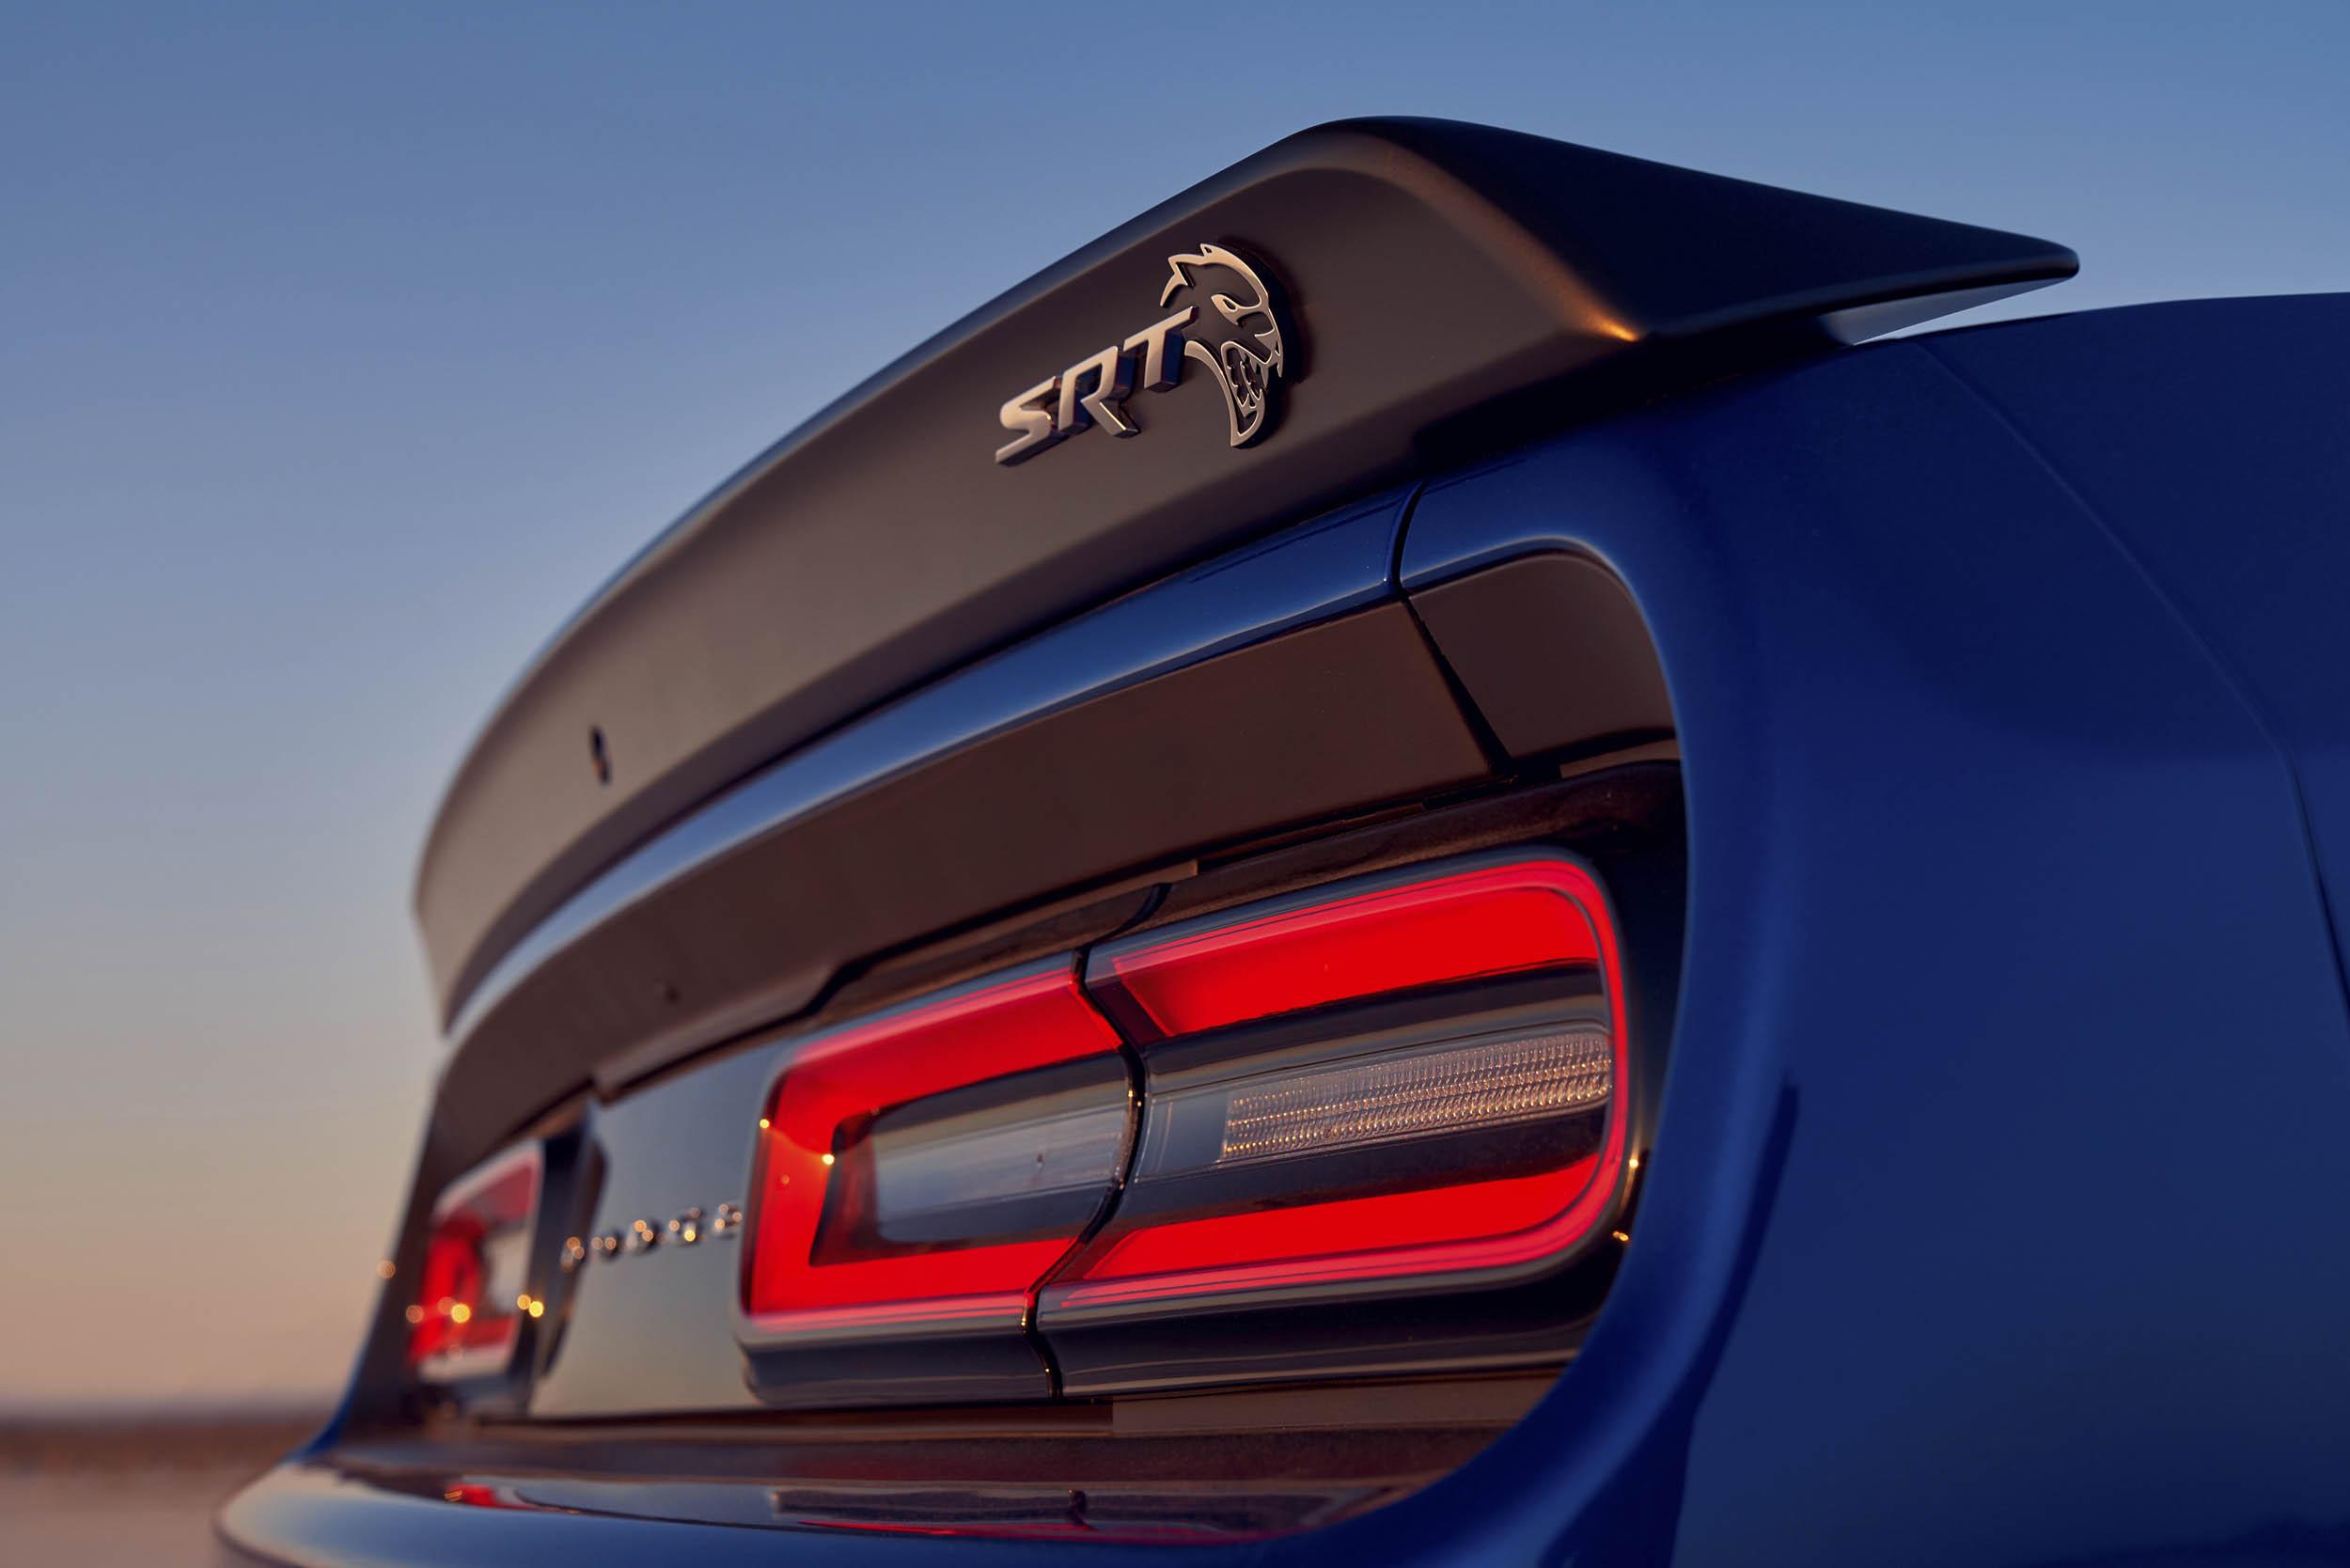 SRT Spoiler on 2019 Dodge Challenger SRT Hellcat Widebody